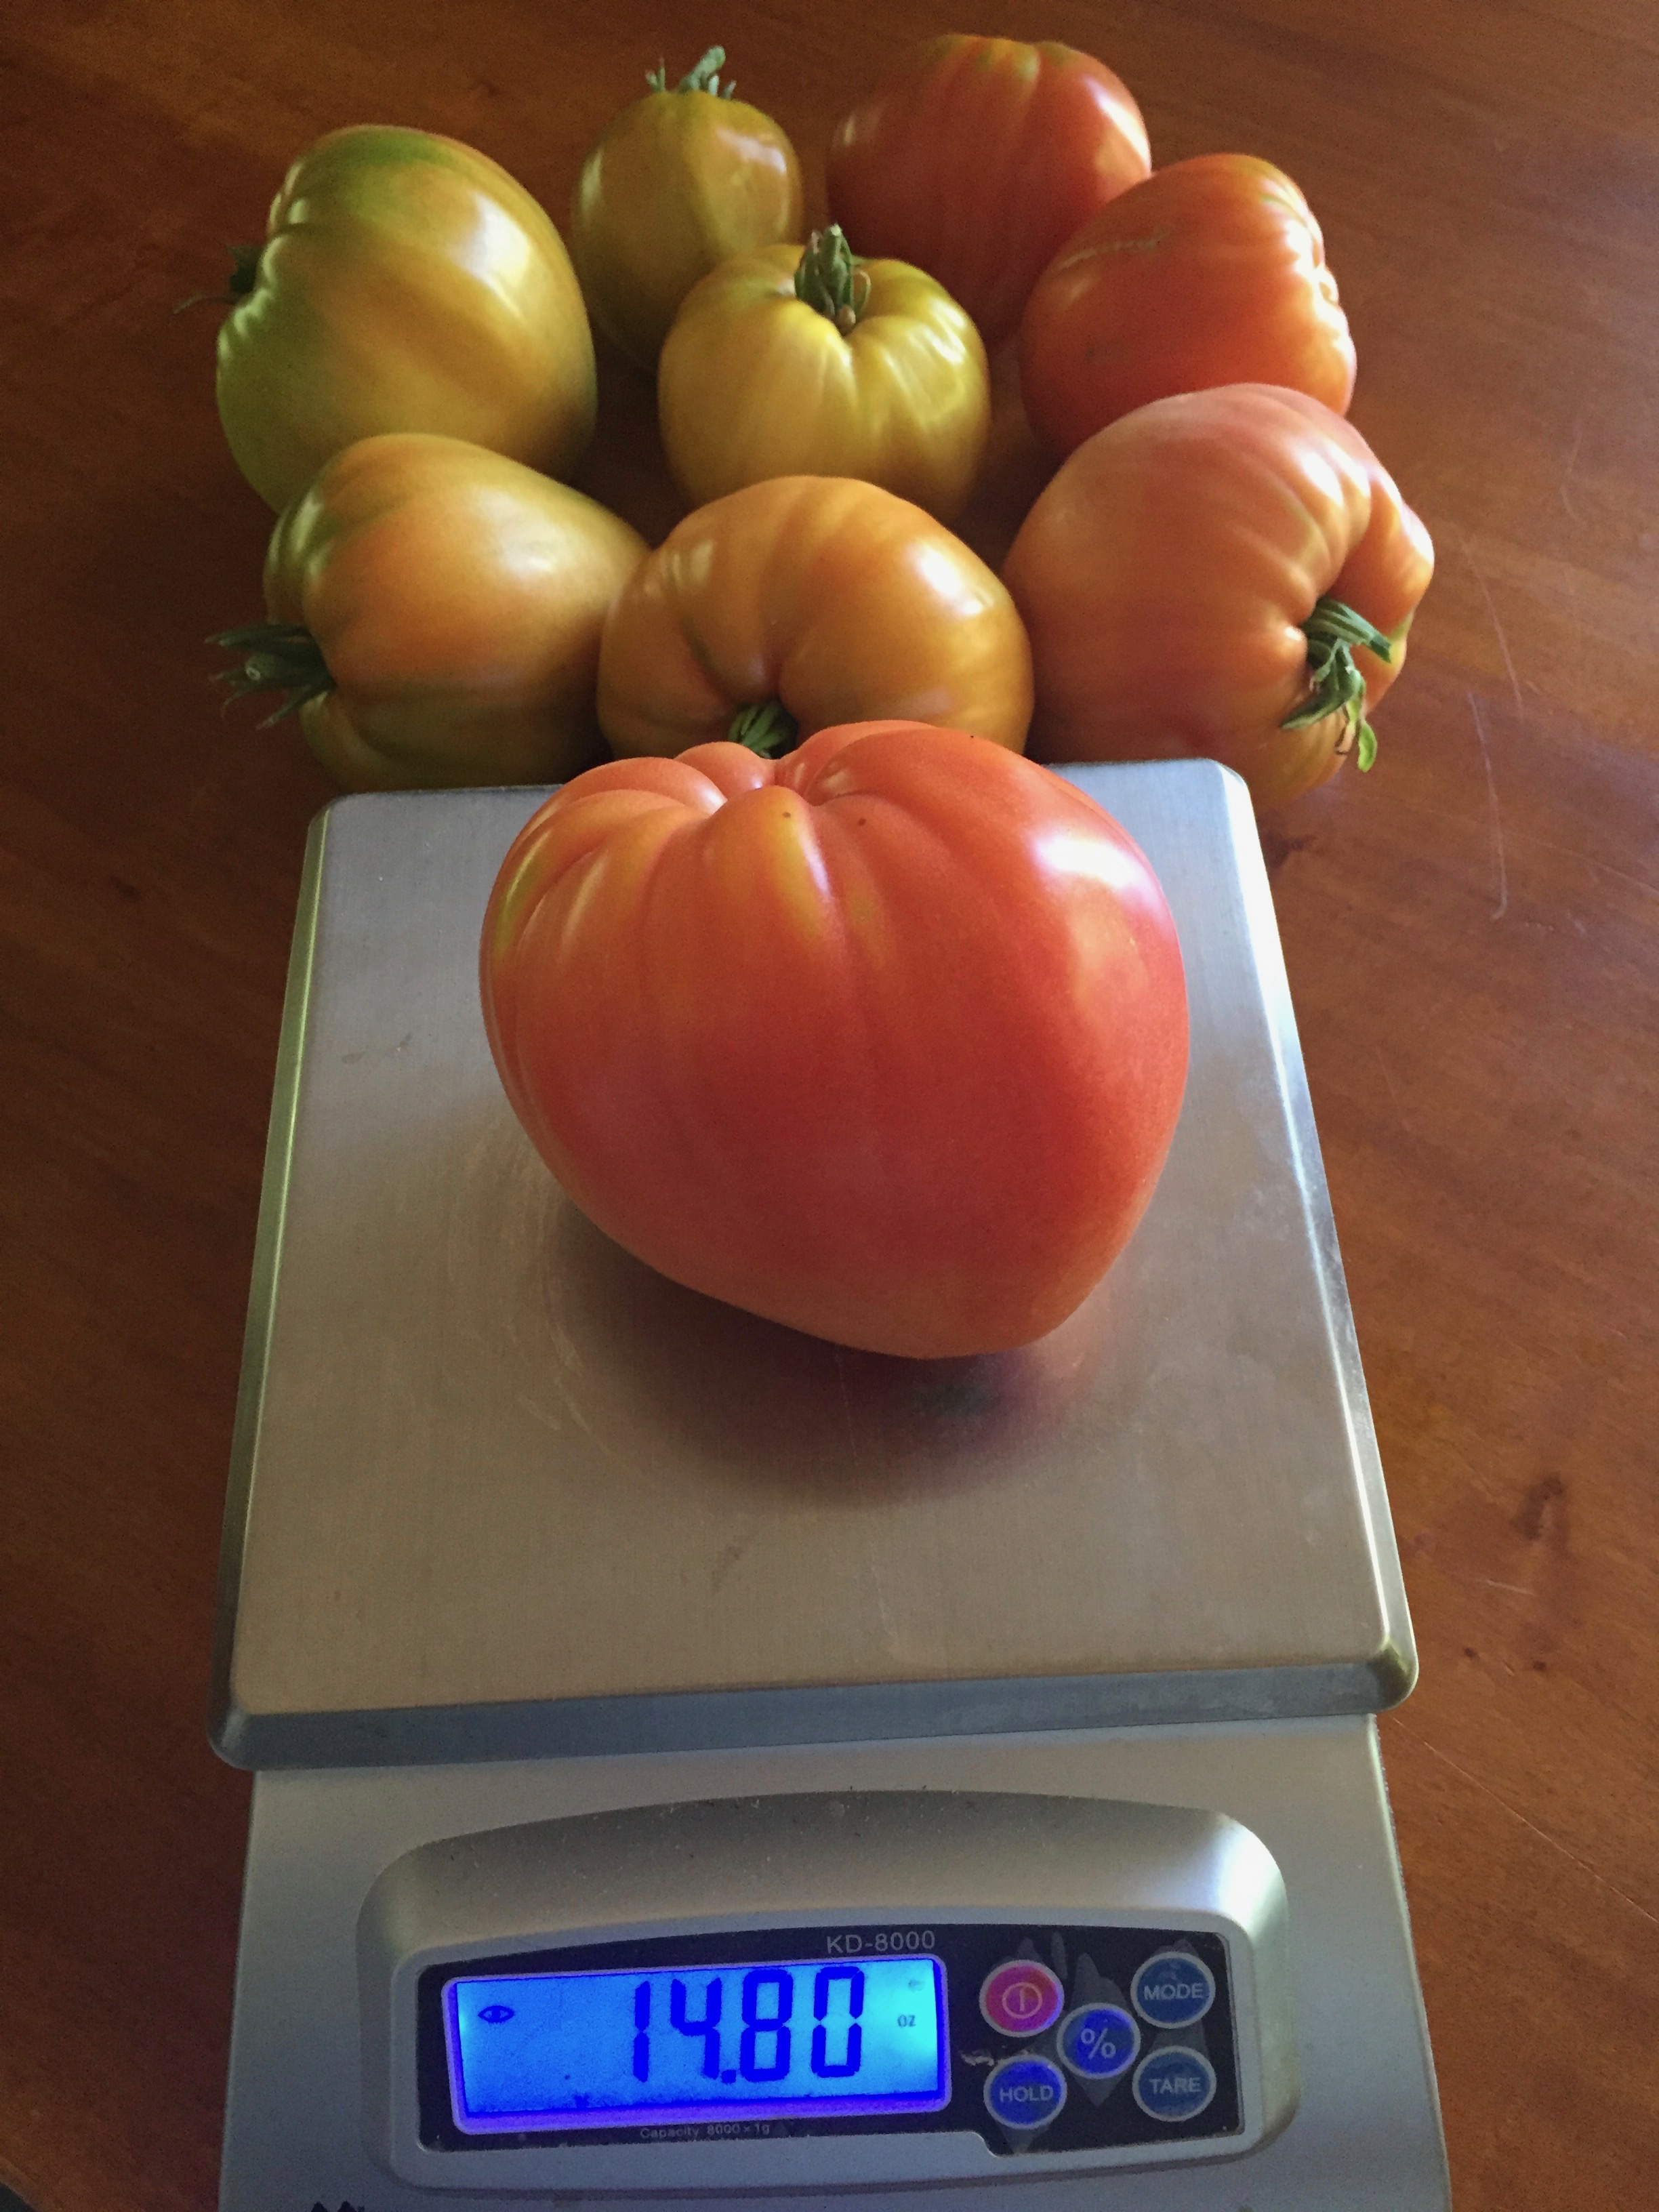 Almost a pound of delicious tomato goodness